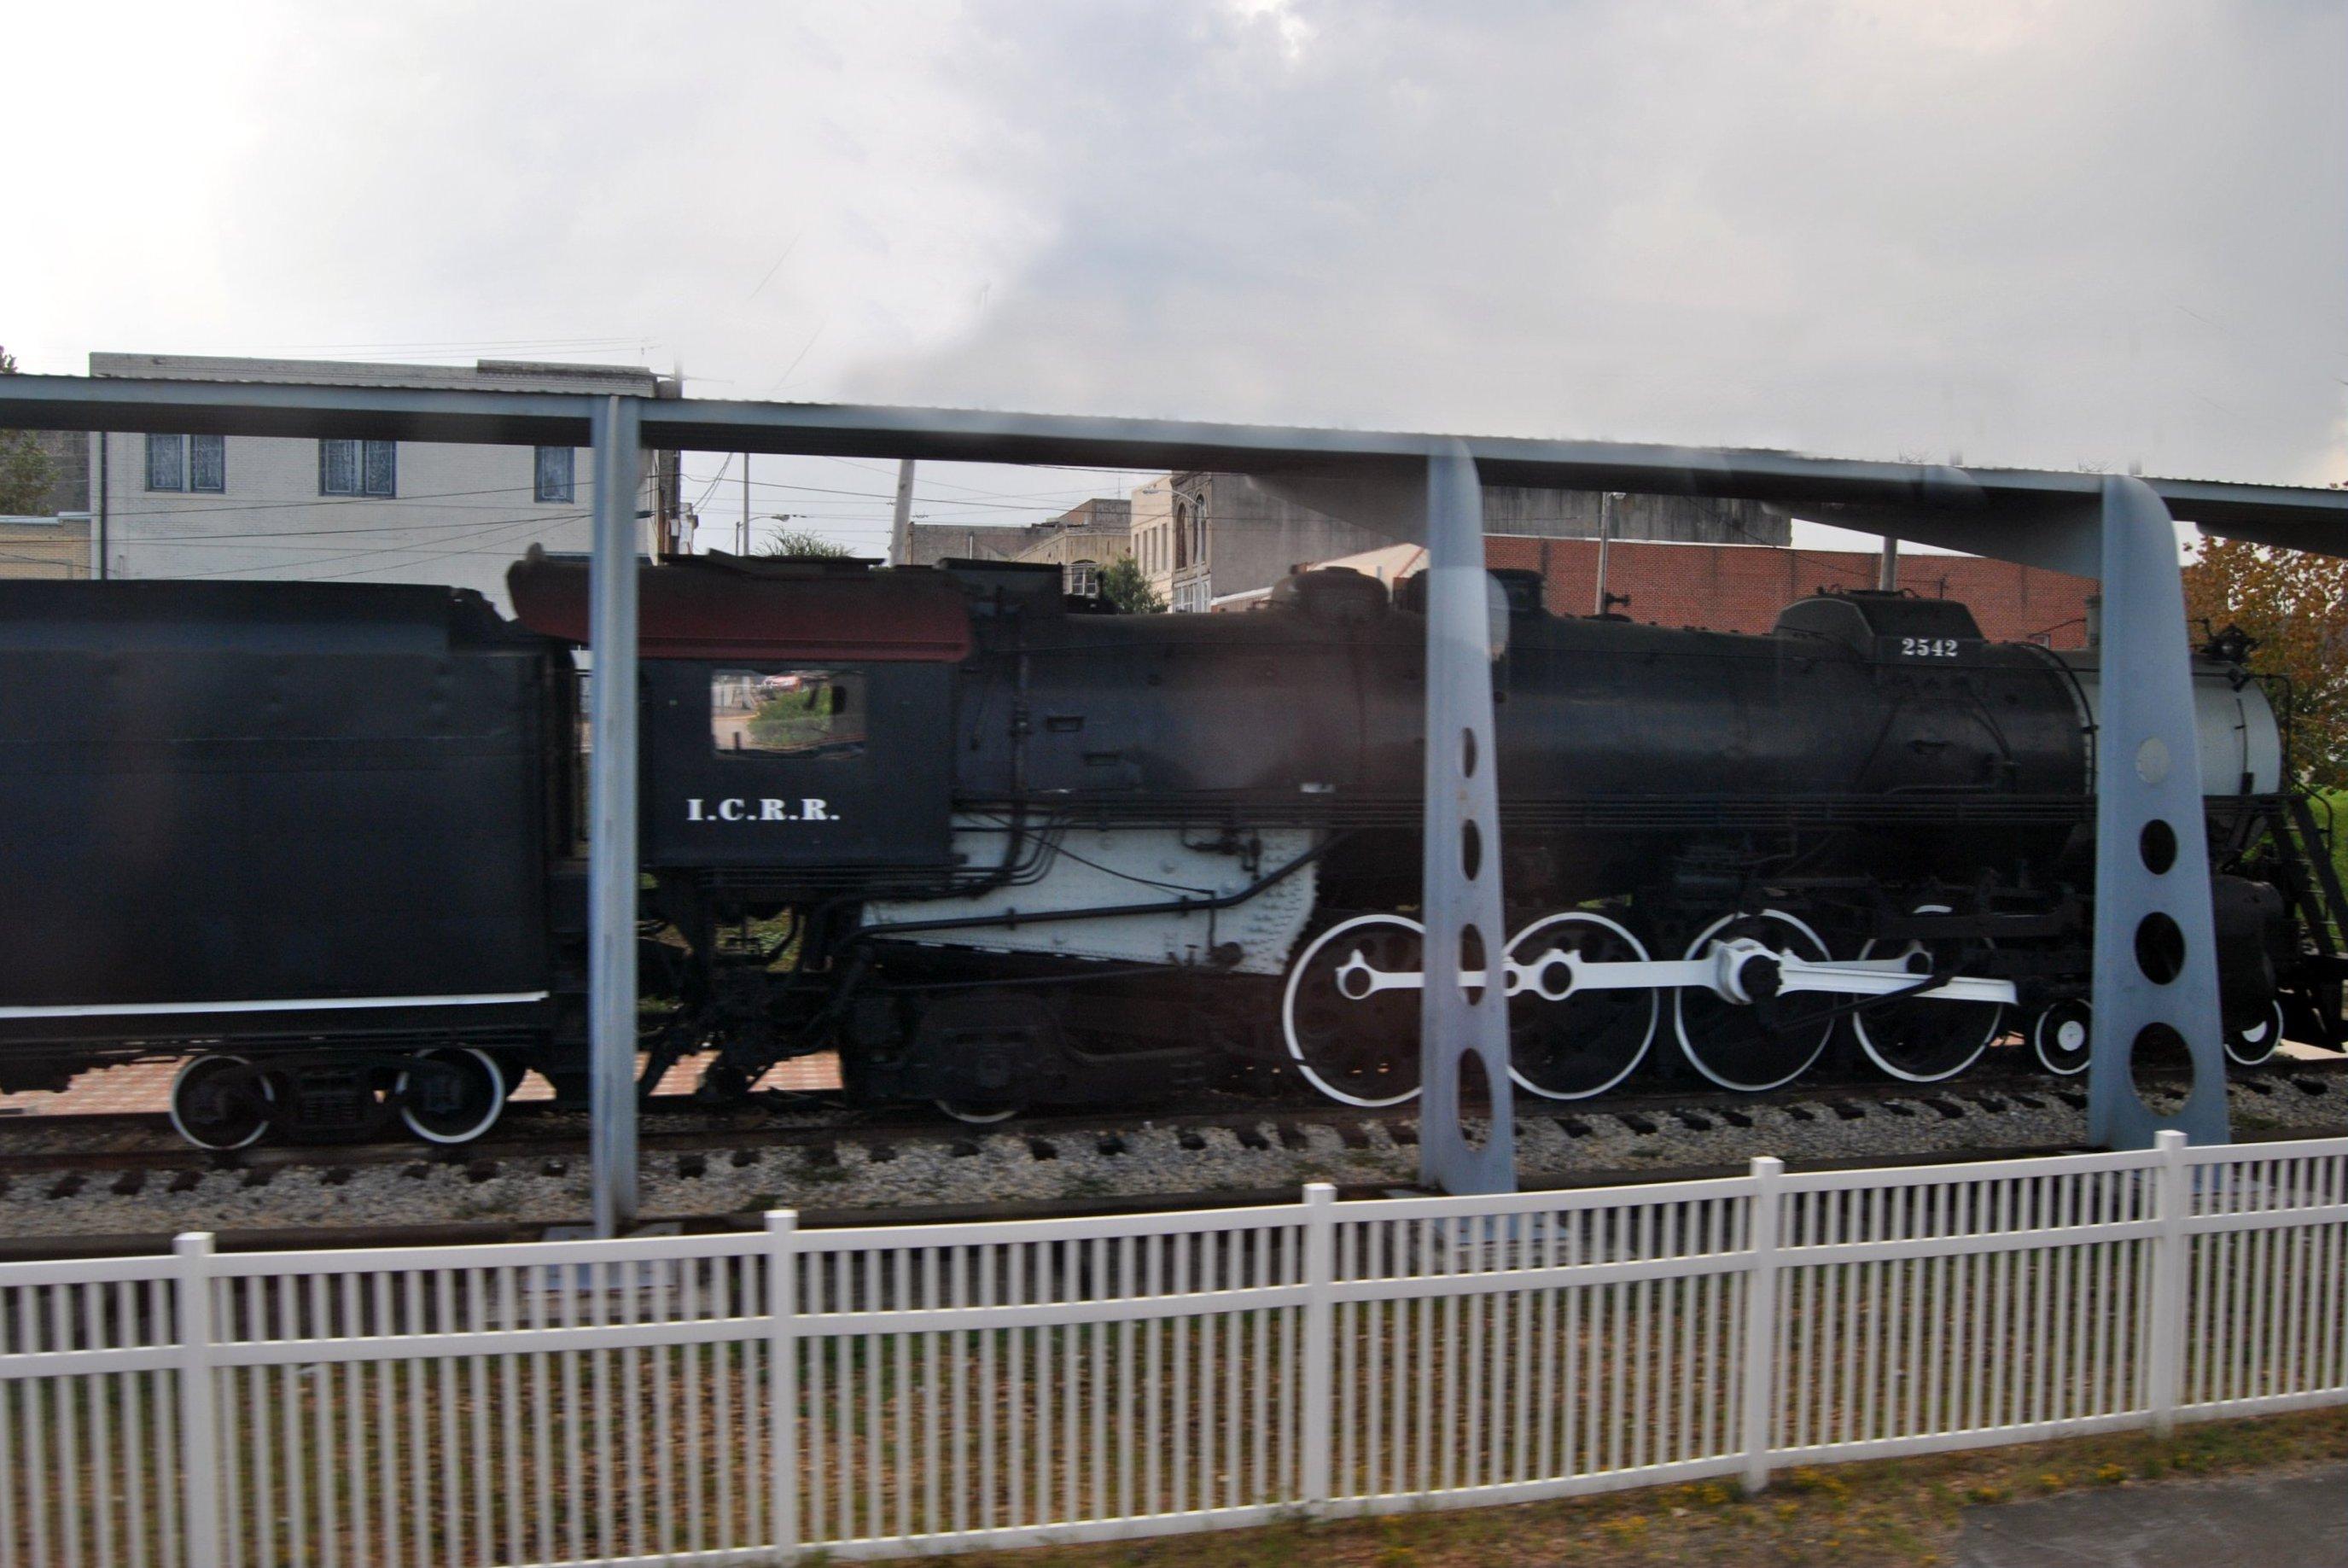 File:2542 Steam Locomotive - McComb MS.jpg